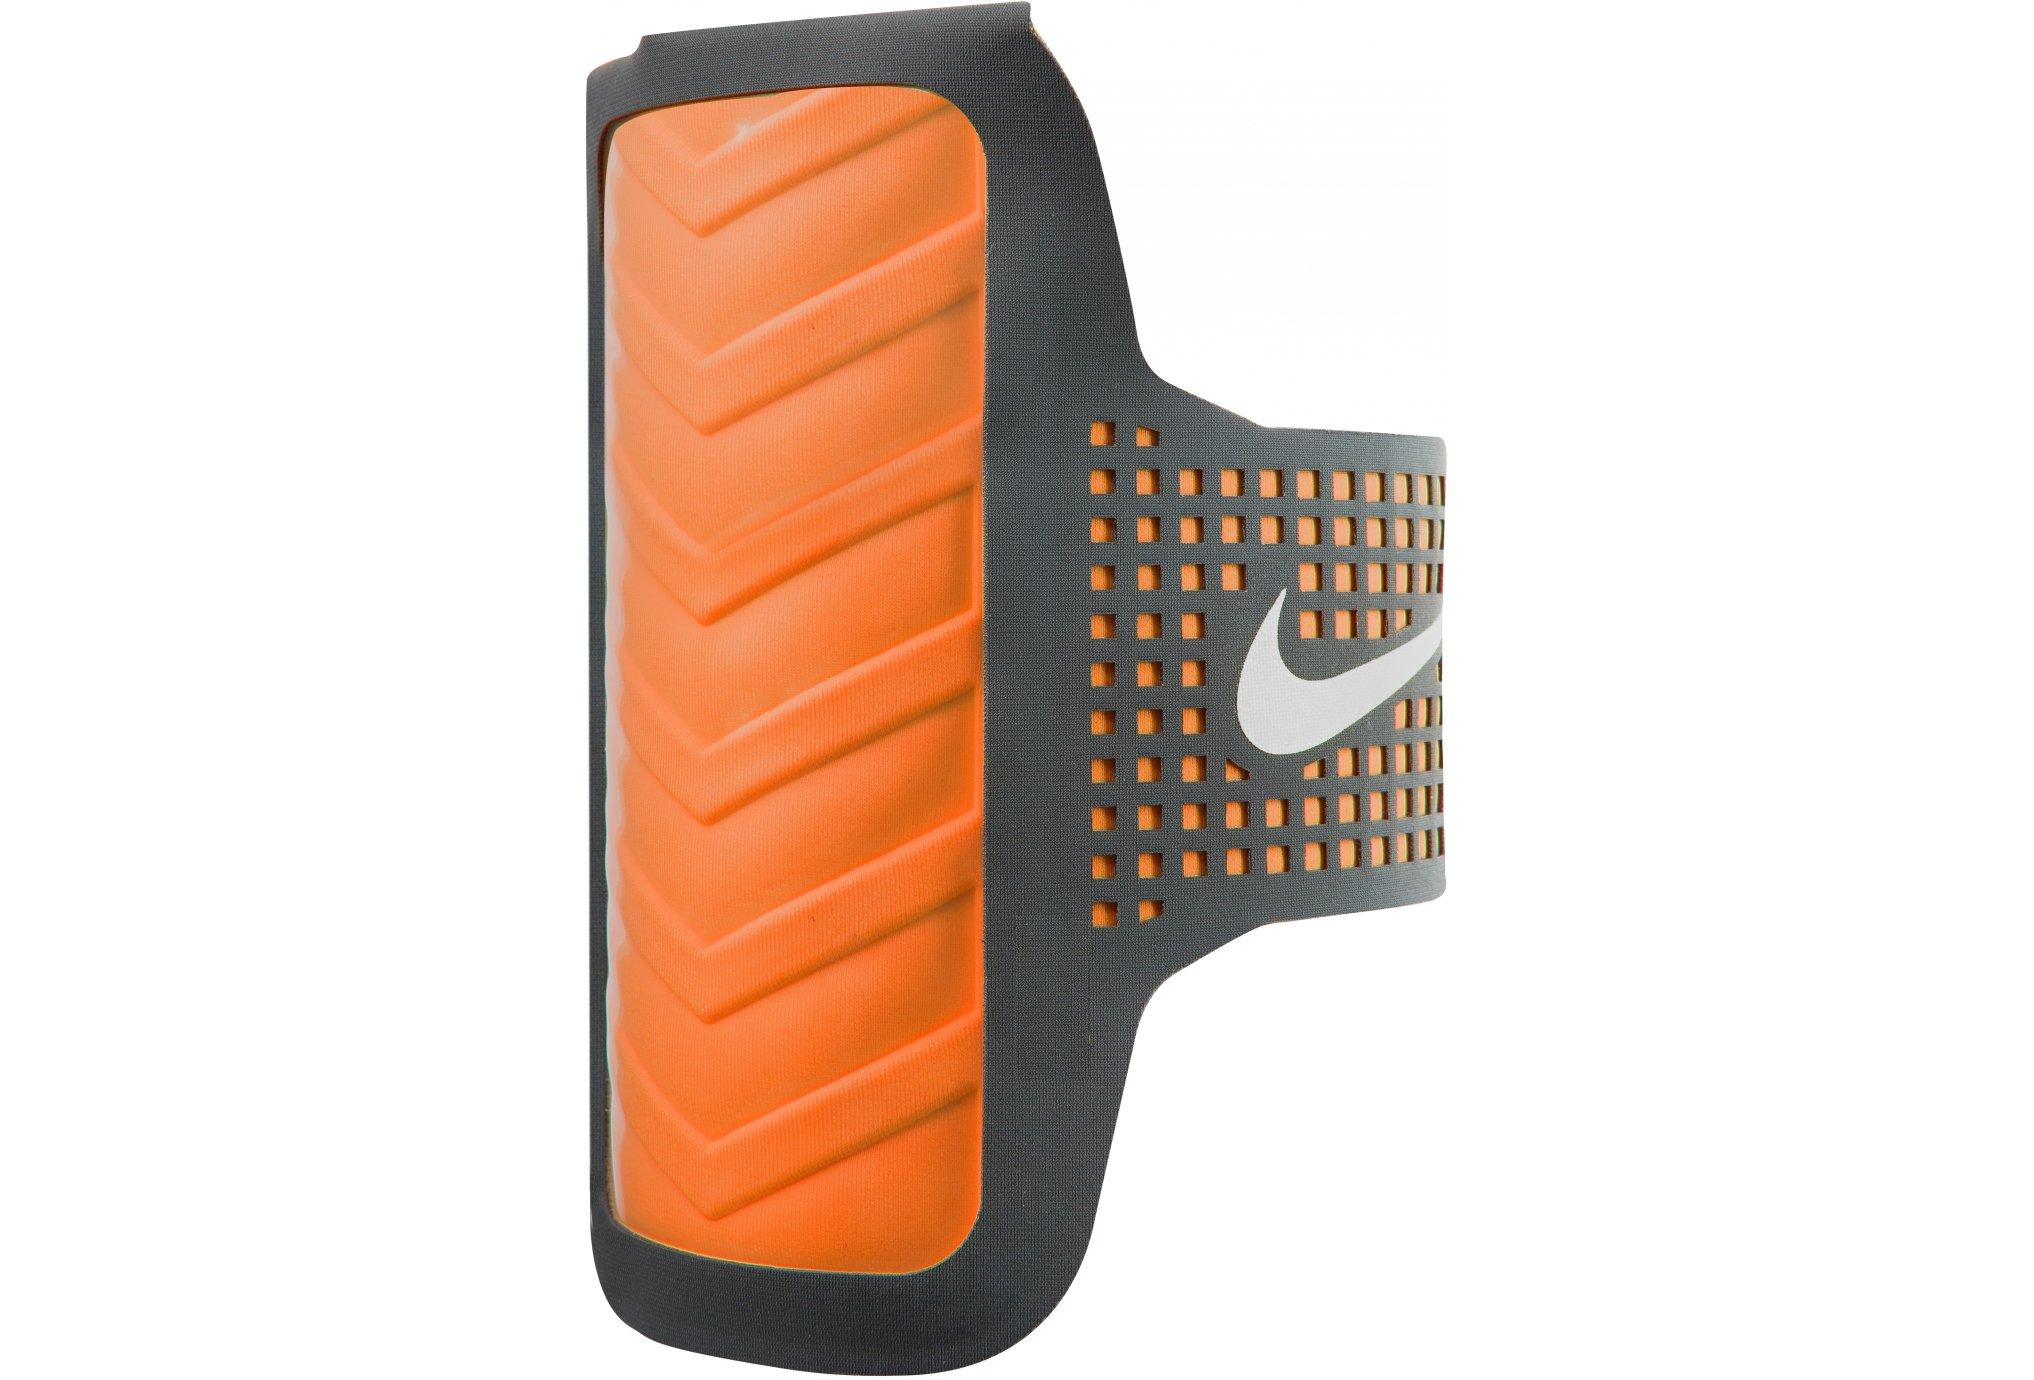 Nike Distance samsung galaxy s4 accessoires téléphone